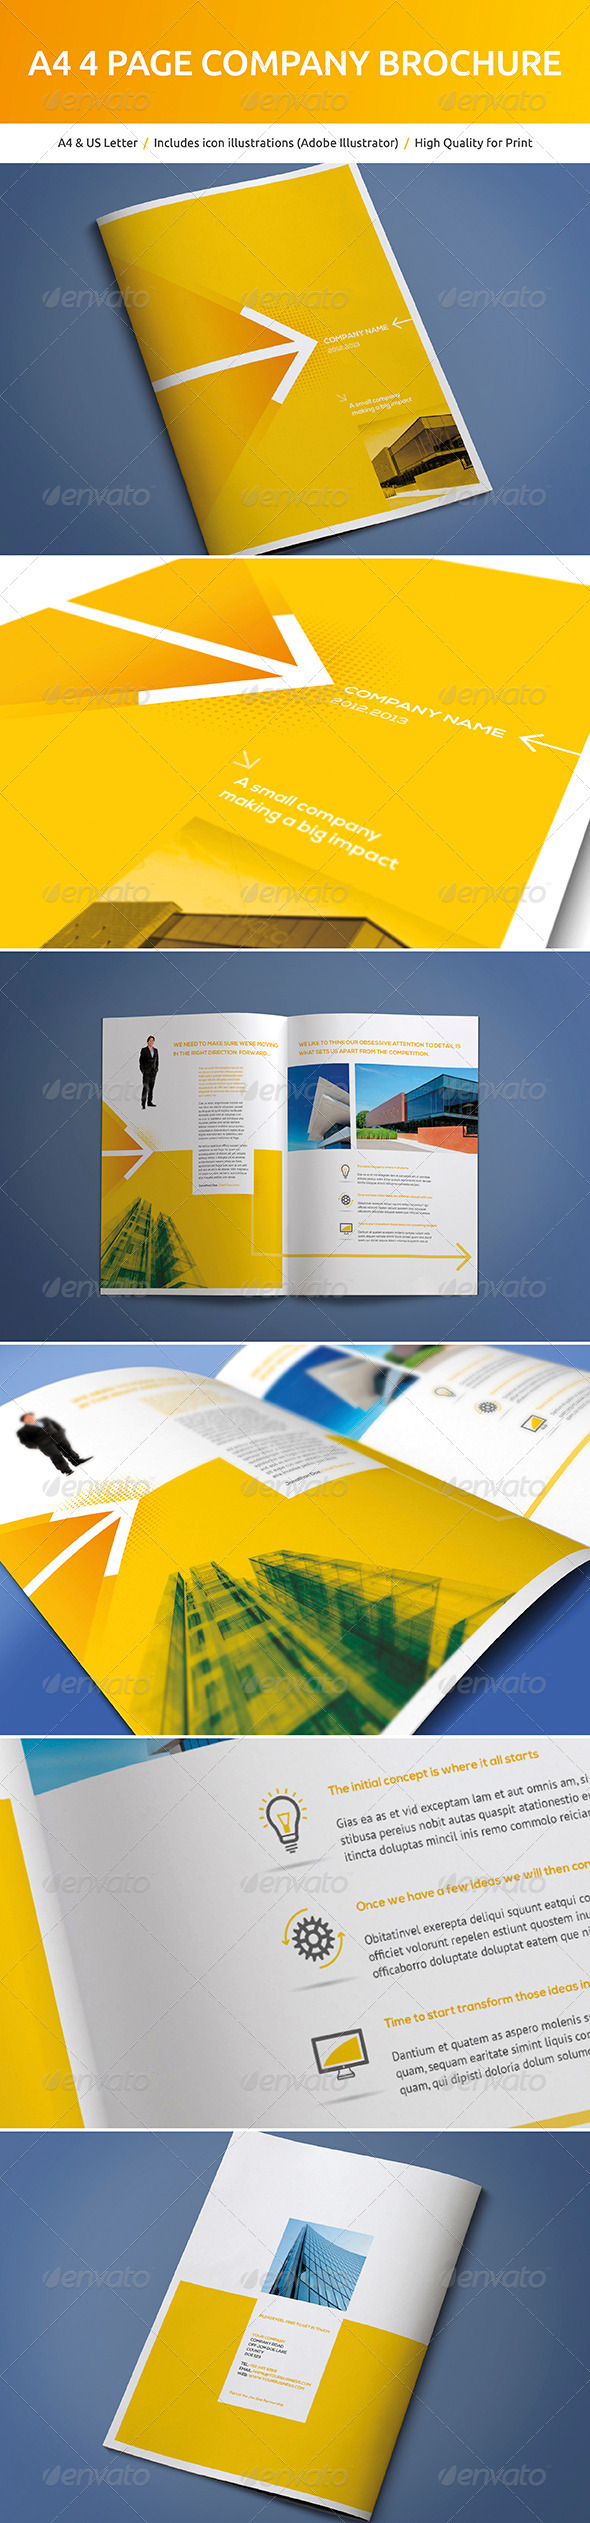 GraphicRiver A4 4 Page Company Brochure 5165979